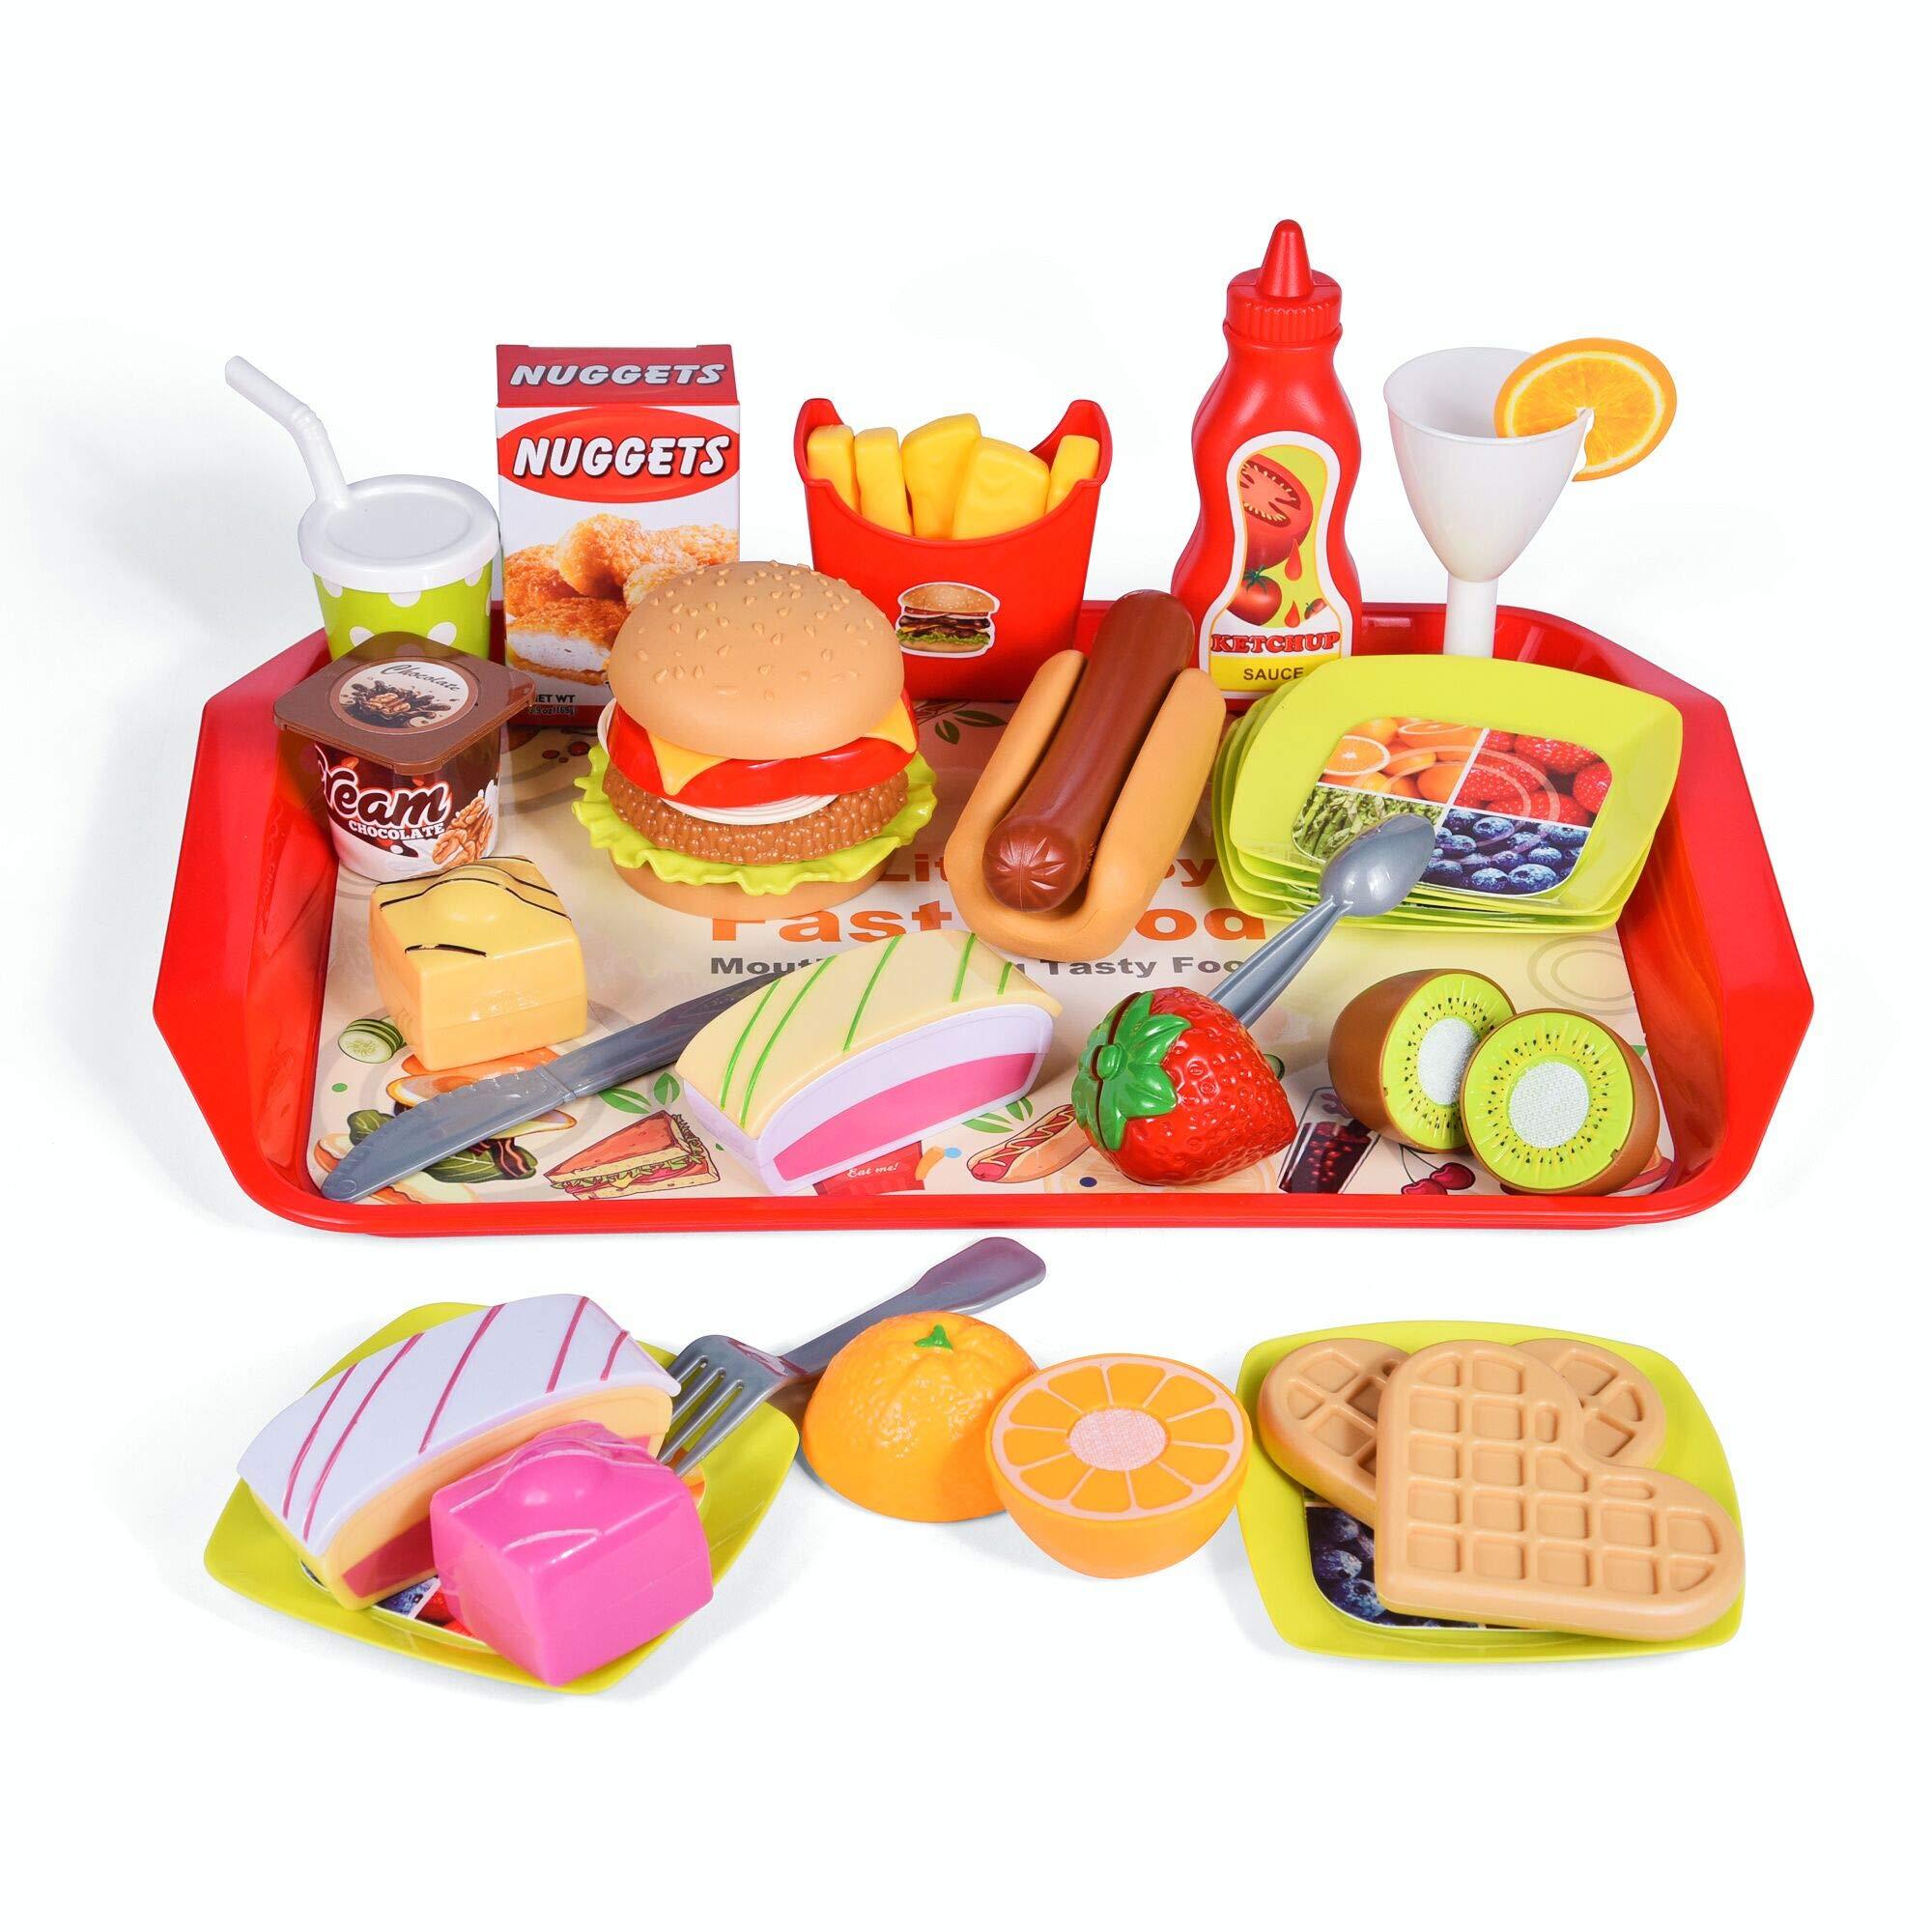 40 PCs Play Food Toys, Pretend Play Kitchen Set Cutting Fruits Play Kitchen Sets Toddlers Pretend Food Playset Children Toy Food Set